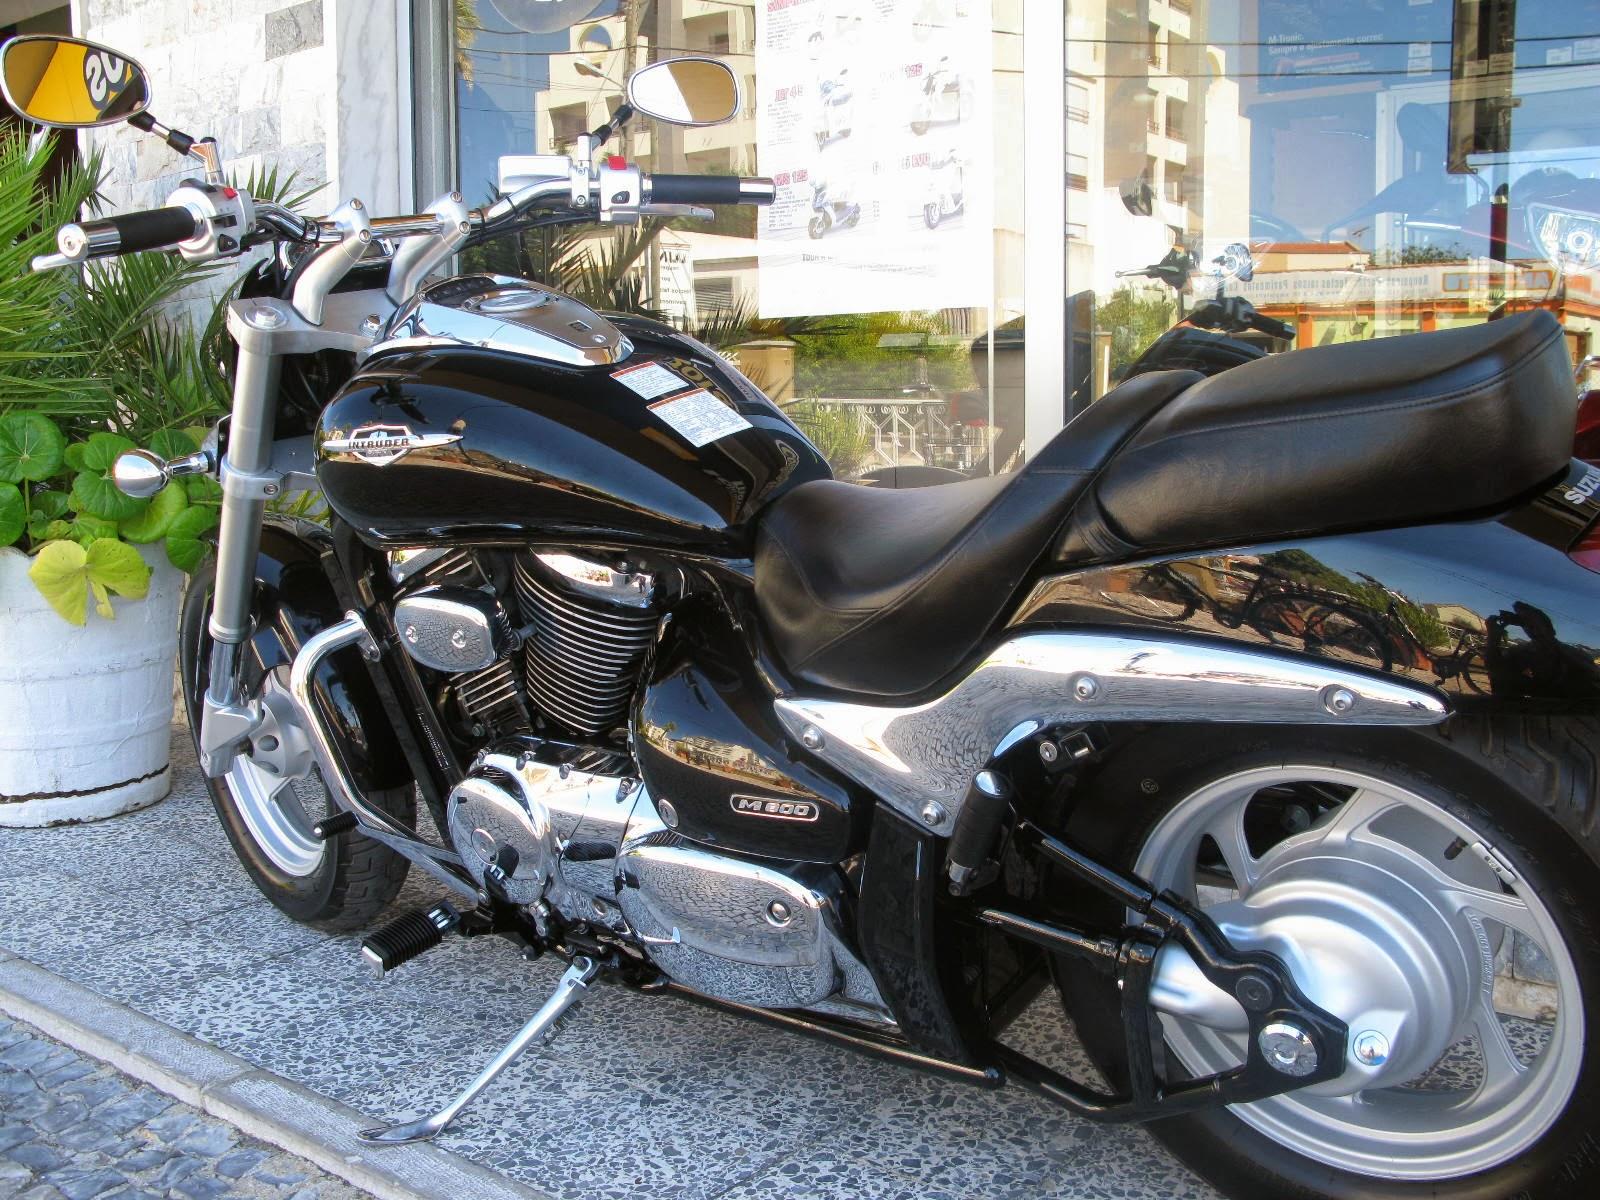 loja das motos suzuki intruder m800. Black Bedroom Furniture Sets. Home Design Ideas